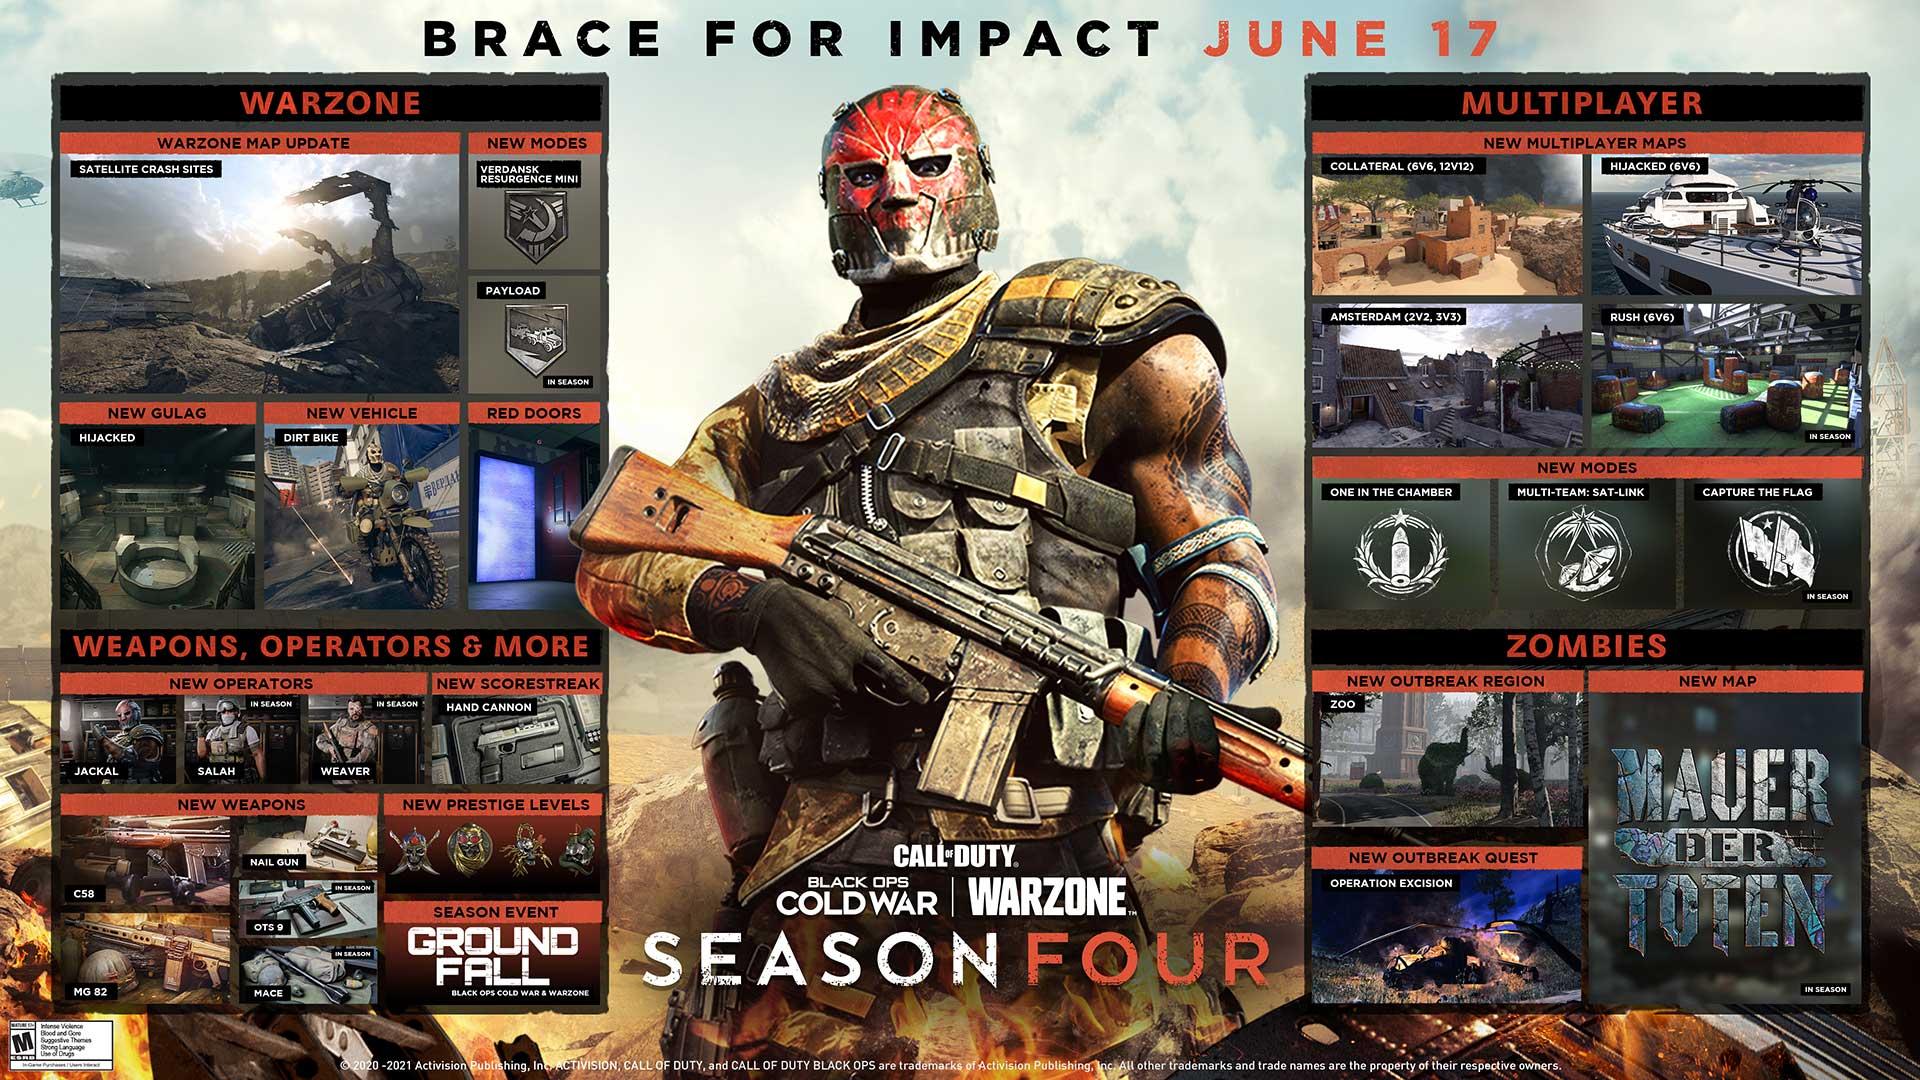 maj-nouveautes-saison-4-warzone-cold-war-call-of-duty